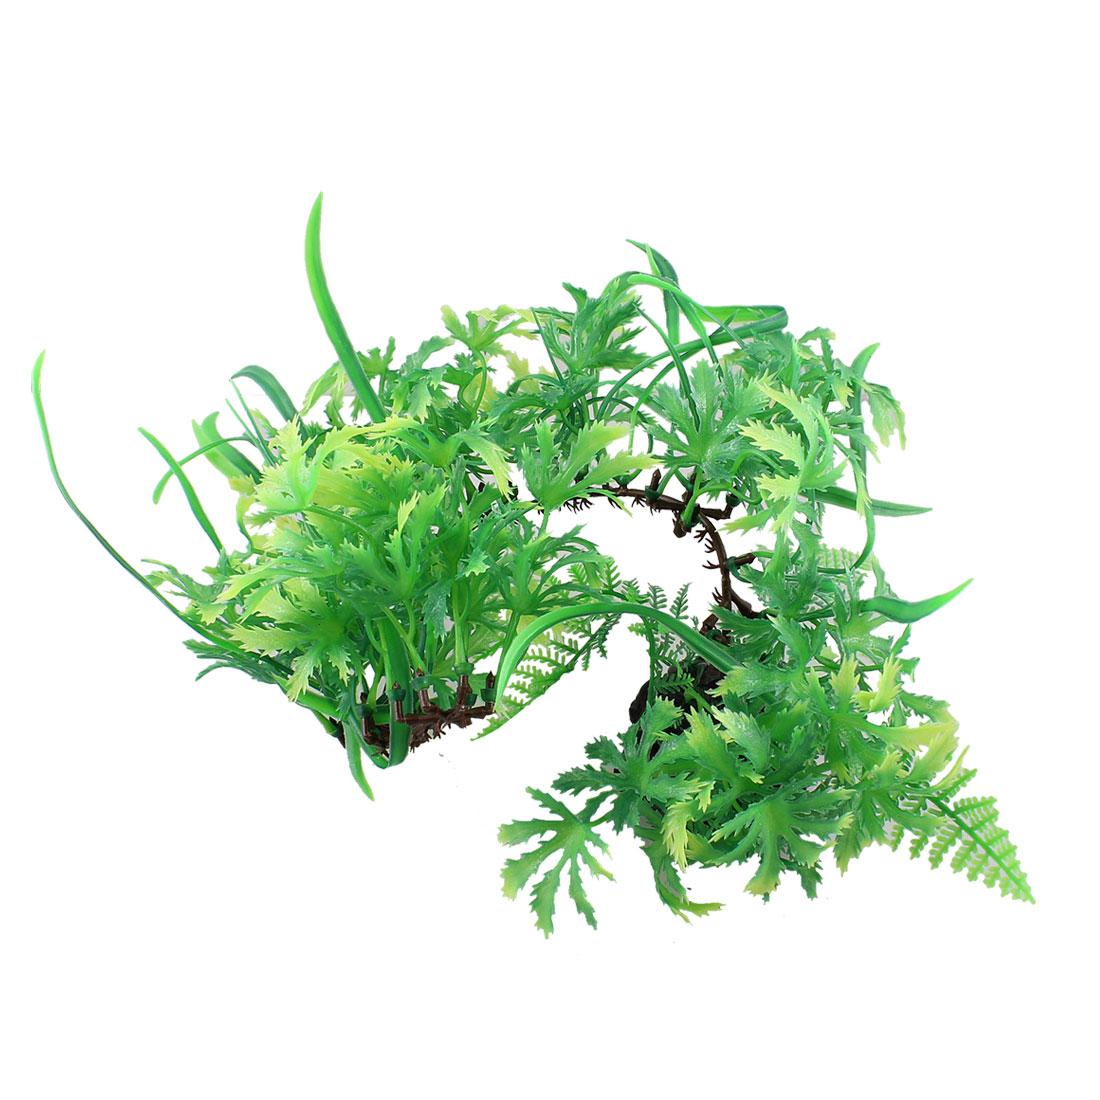 "5"" Height Green Plastic Underwater Grass Plants for Aquarium Fish Tank"